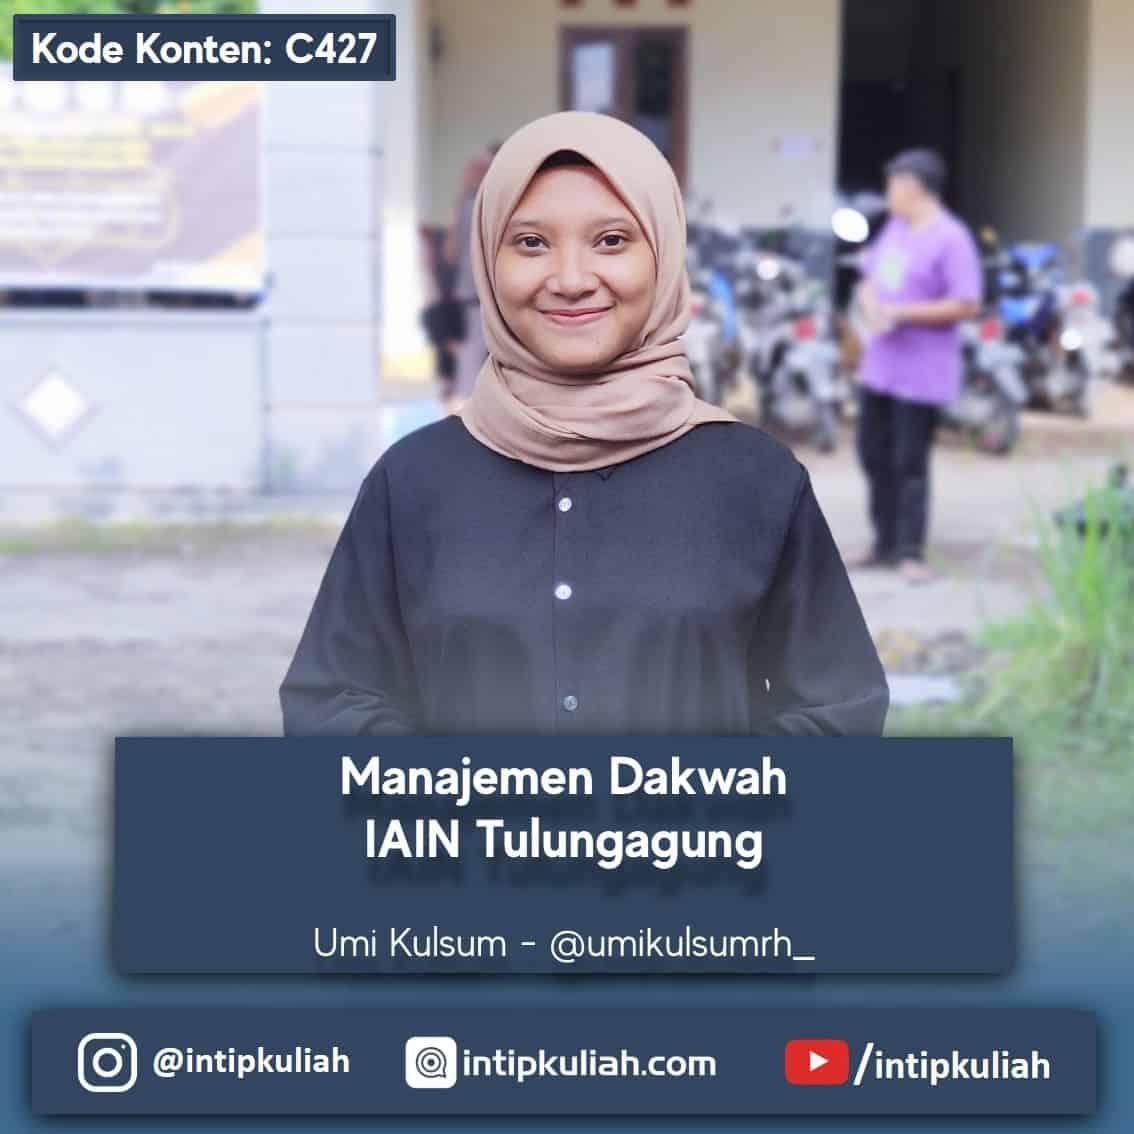 Manajemen Dakwah IAIN Tulungagung (Umi)